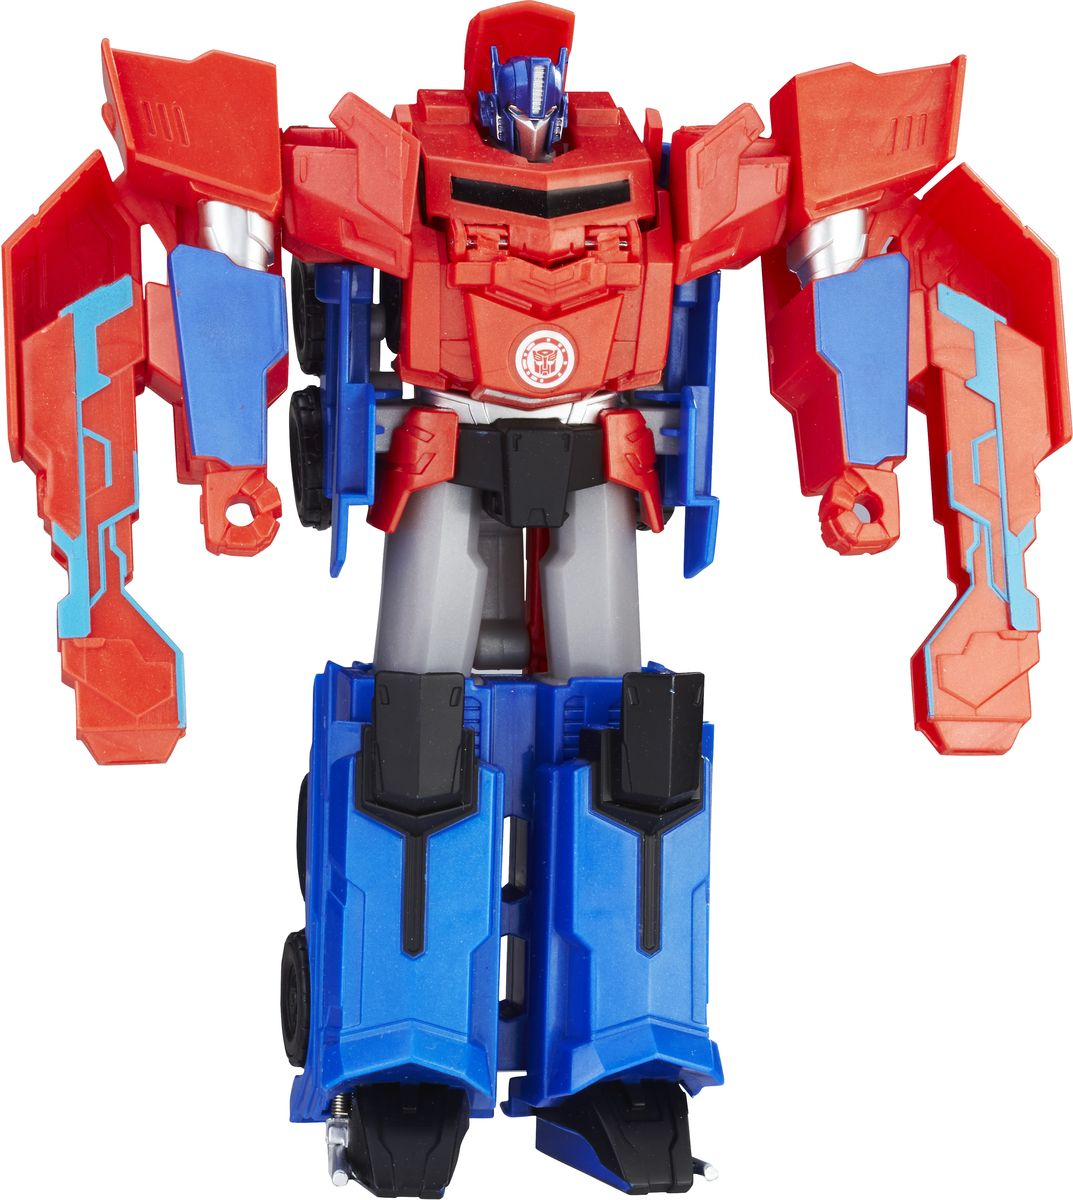 Transformers Трансформер Optimus Prime B0067 stylish transformers optimus prime decepticon pendant necklace